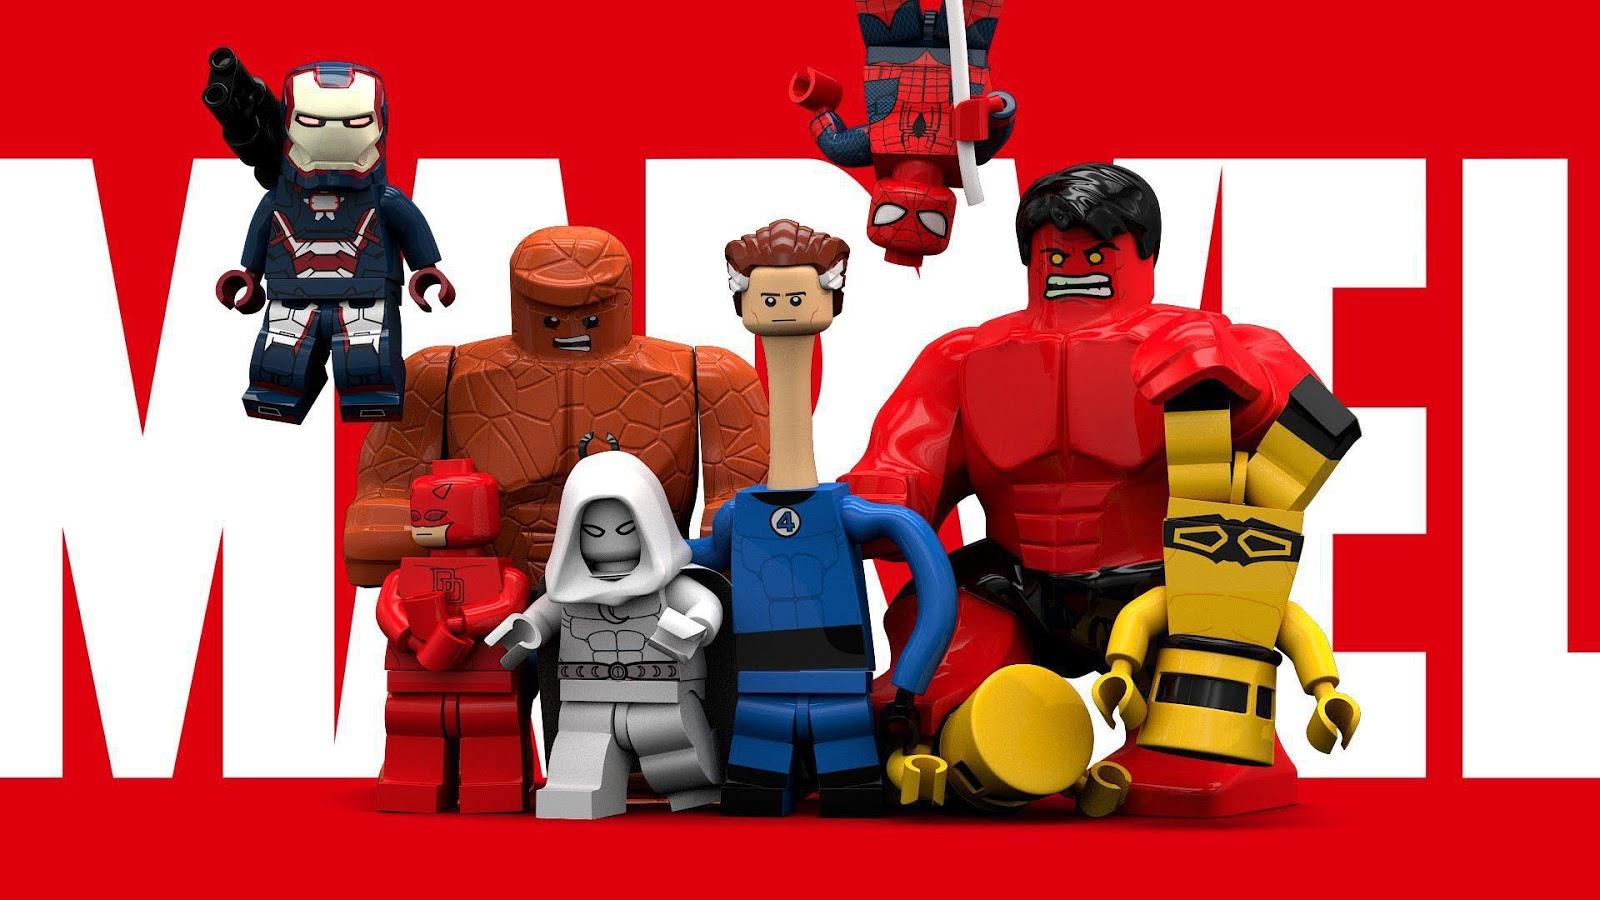 Lego marvel super heroes 2 hd wallpapers read games reviews play lego marvel super heroes 2 xbox 360 wallpaper voltagebd Gallery